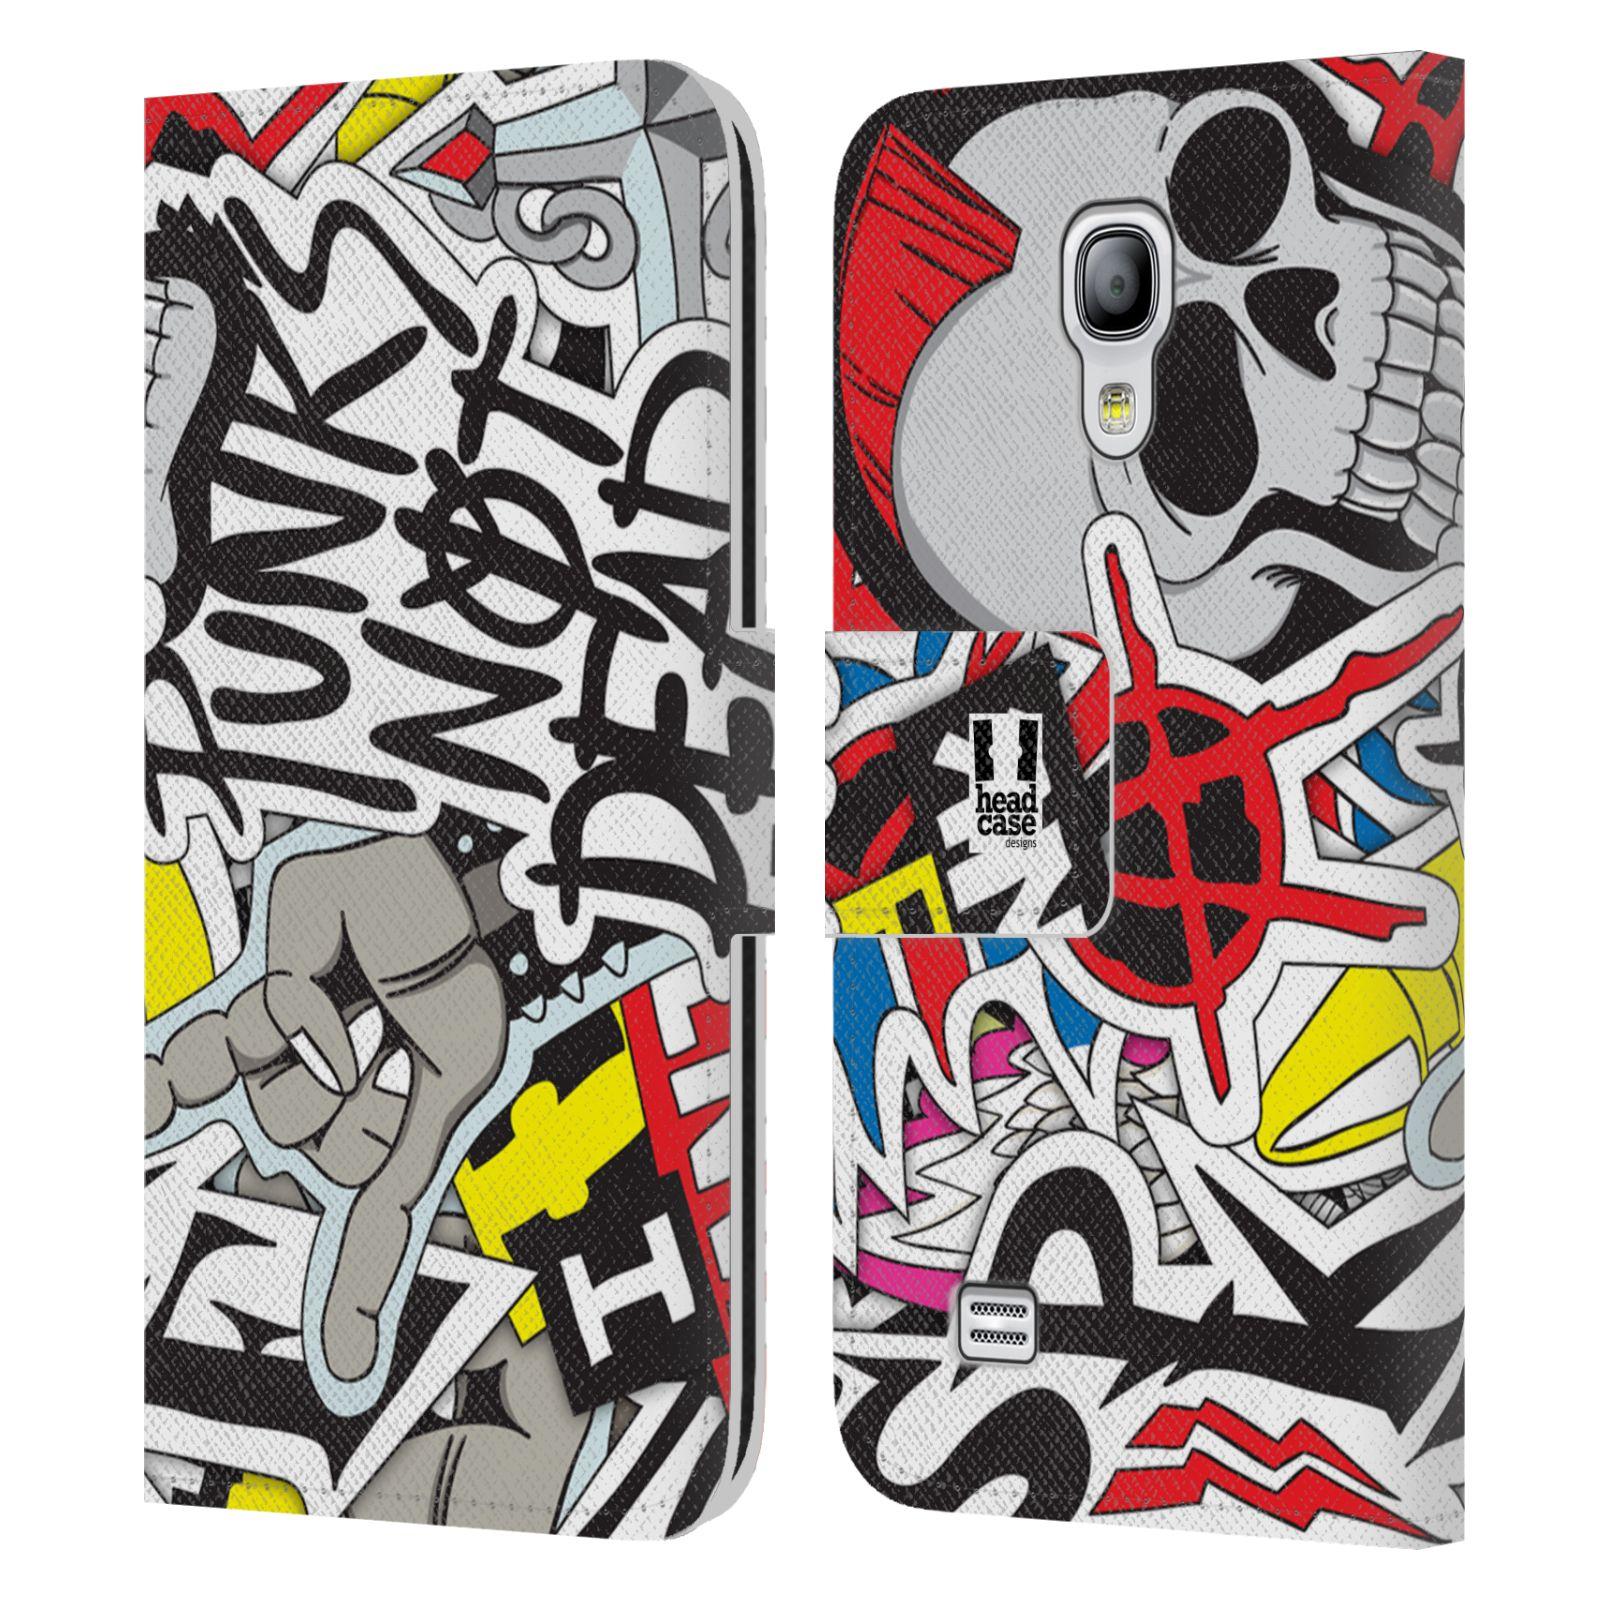 HEAD CASE Flipové pouzdro pro mobil Samsung Galaxy S4 MINI / S4 MINI DUOS vzor STICKER nálepky PUNK IS NOT DEAD